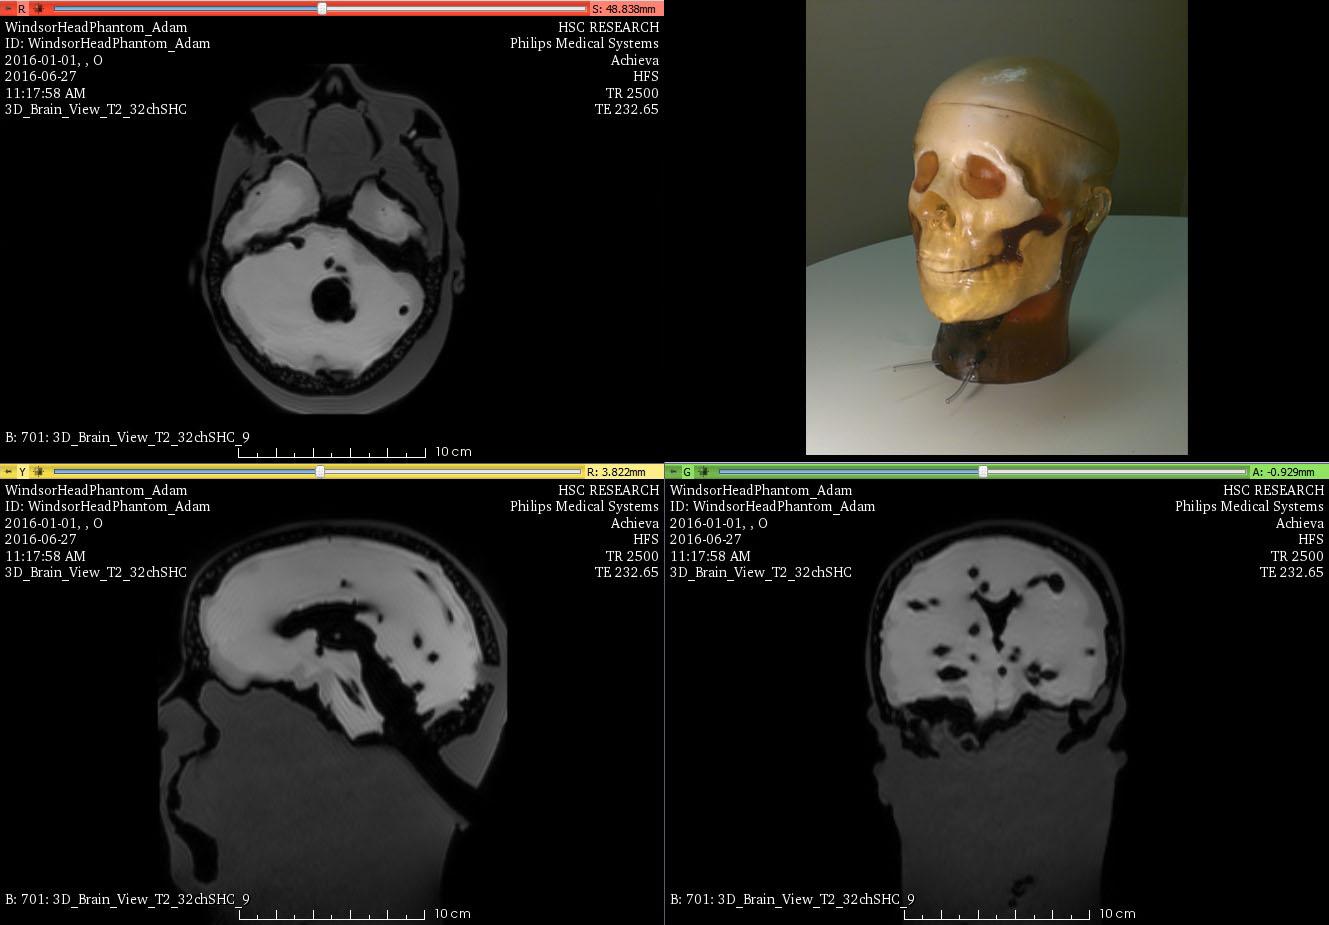 MRI Head Phantom